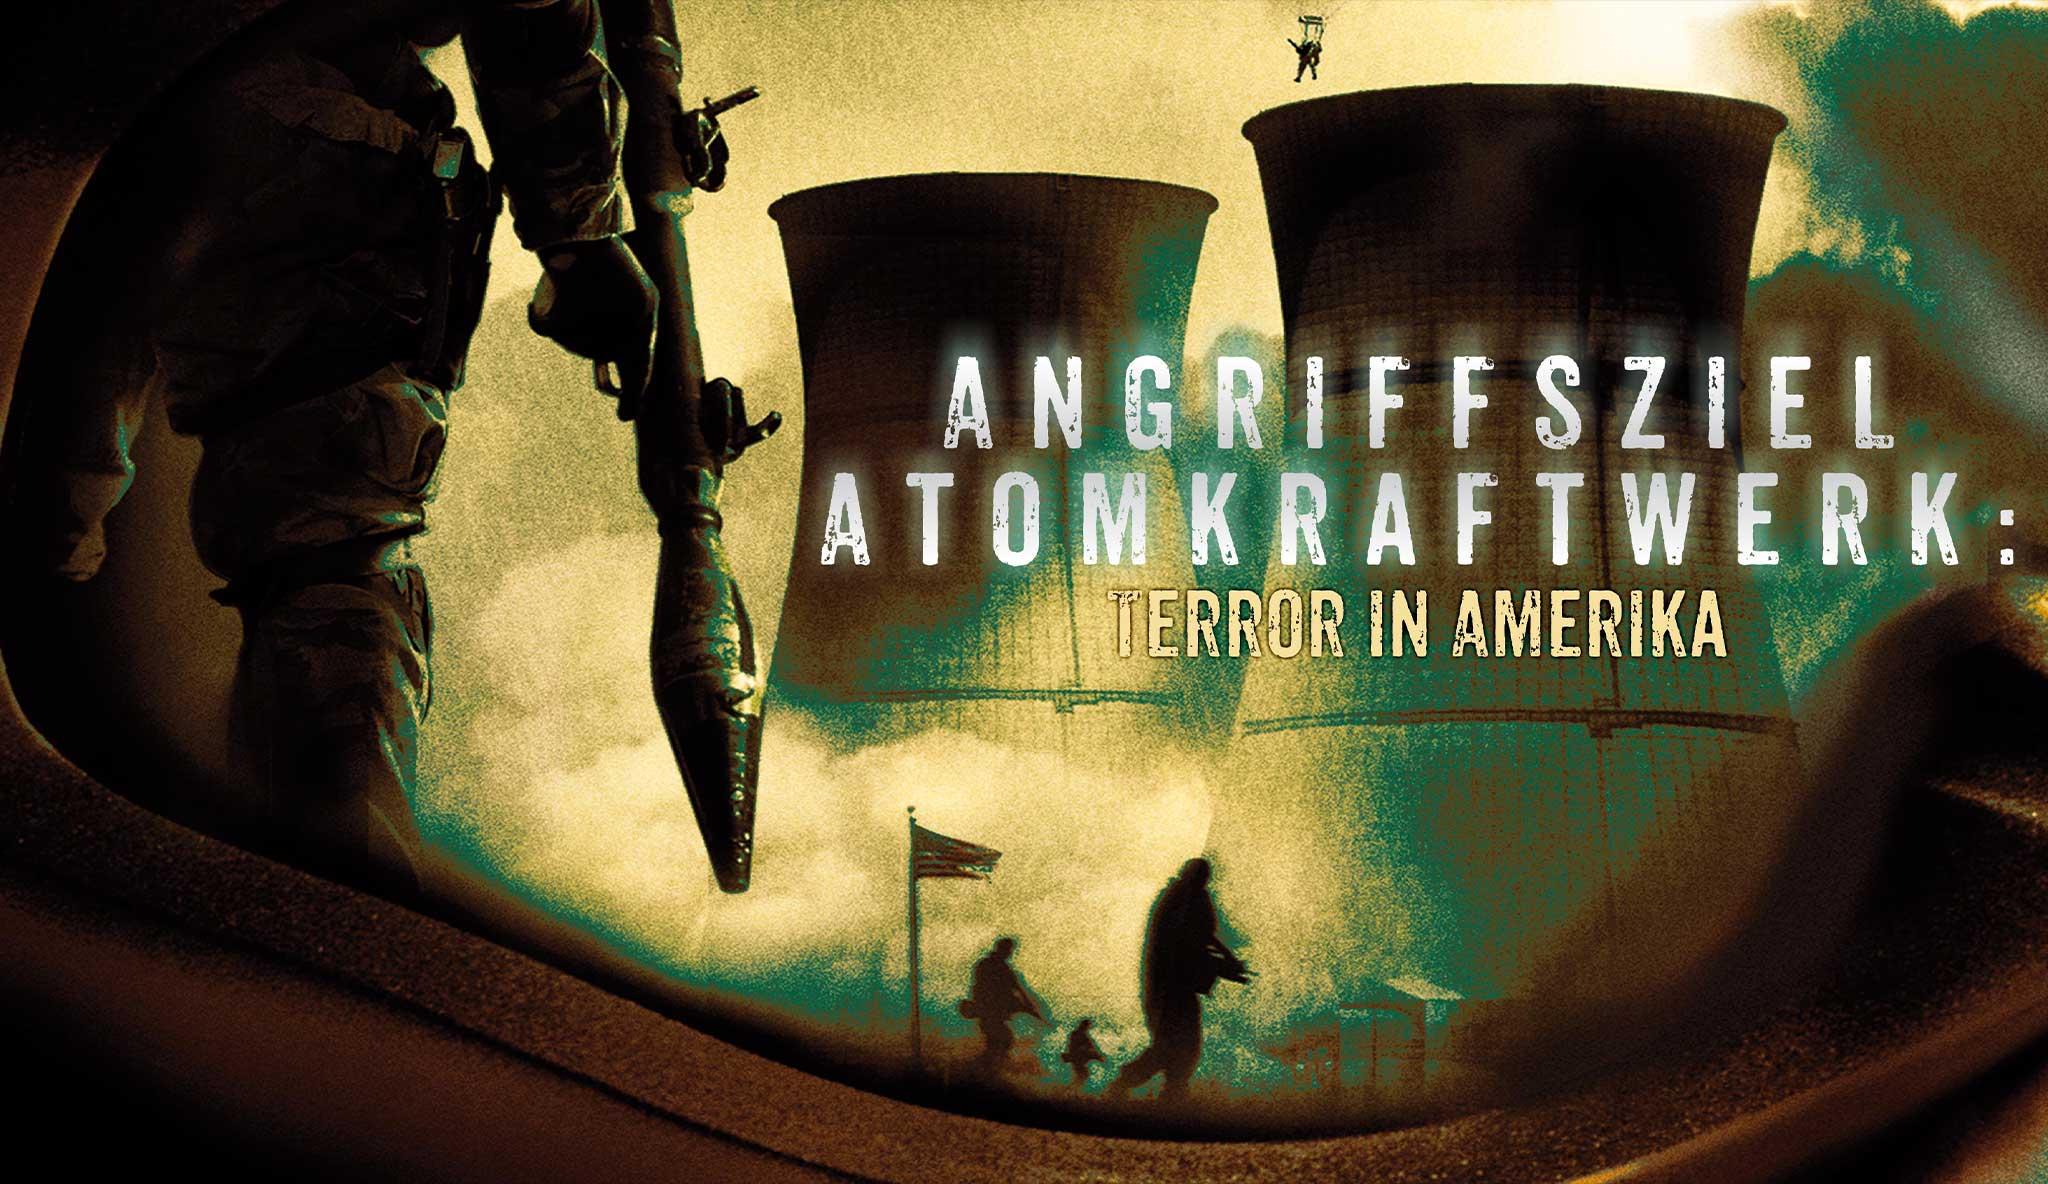 angriffsziel-atomkraftwerk-terror-in-amerika\header.jpg